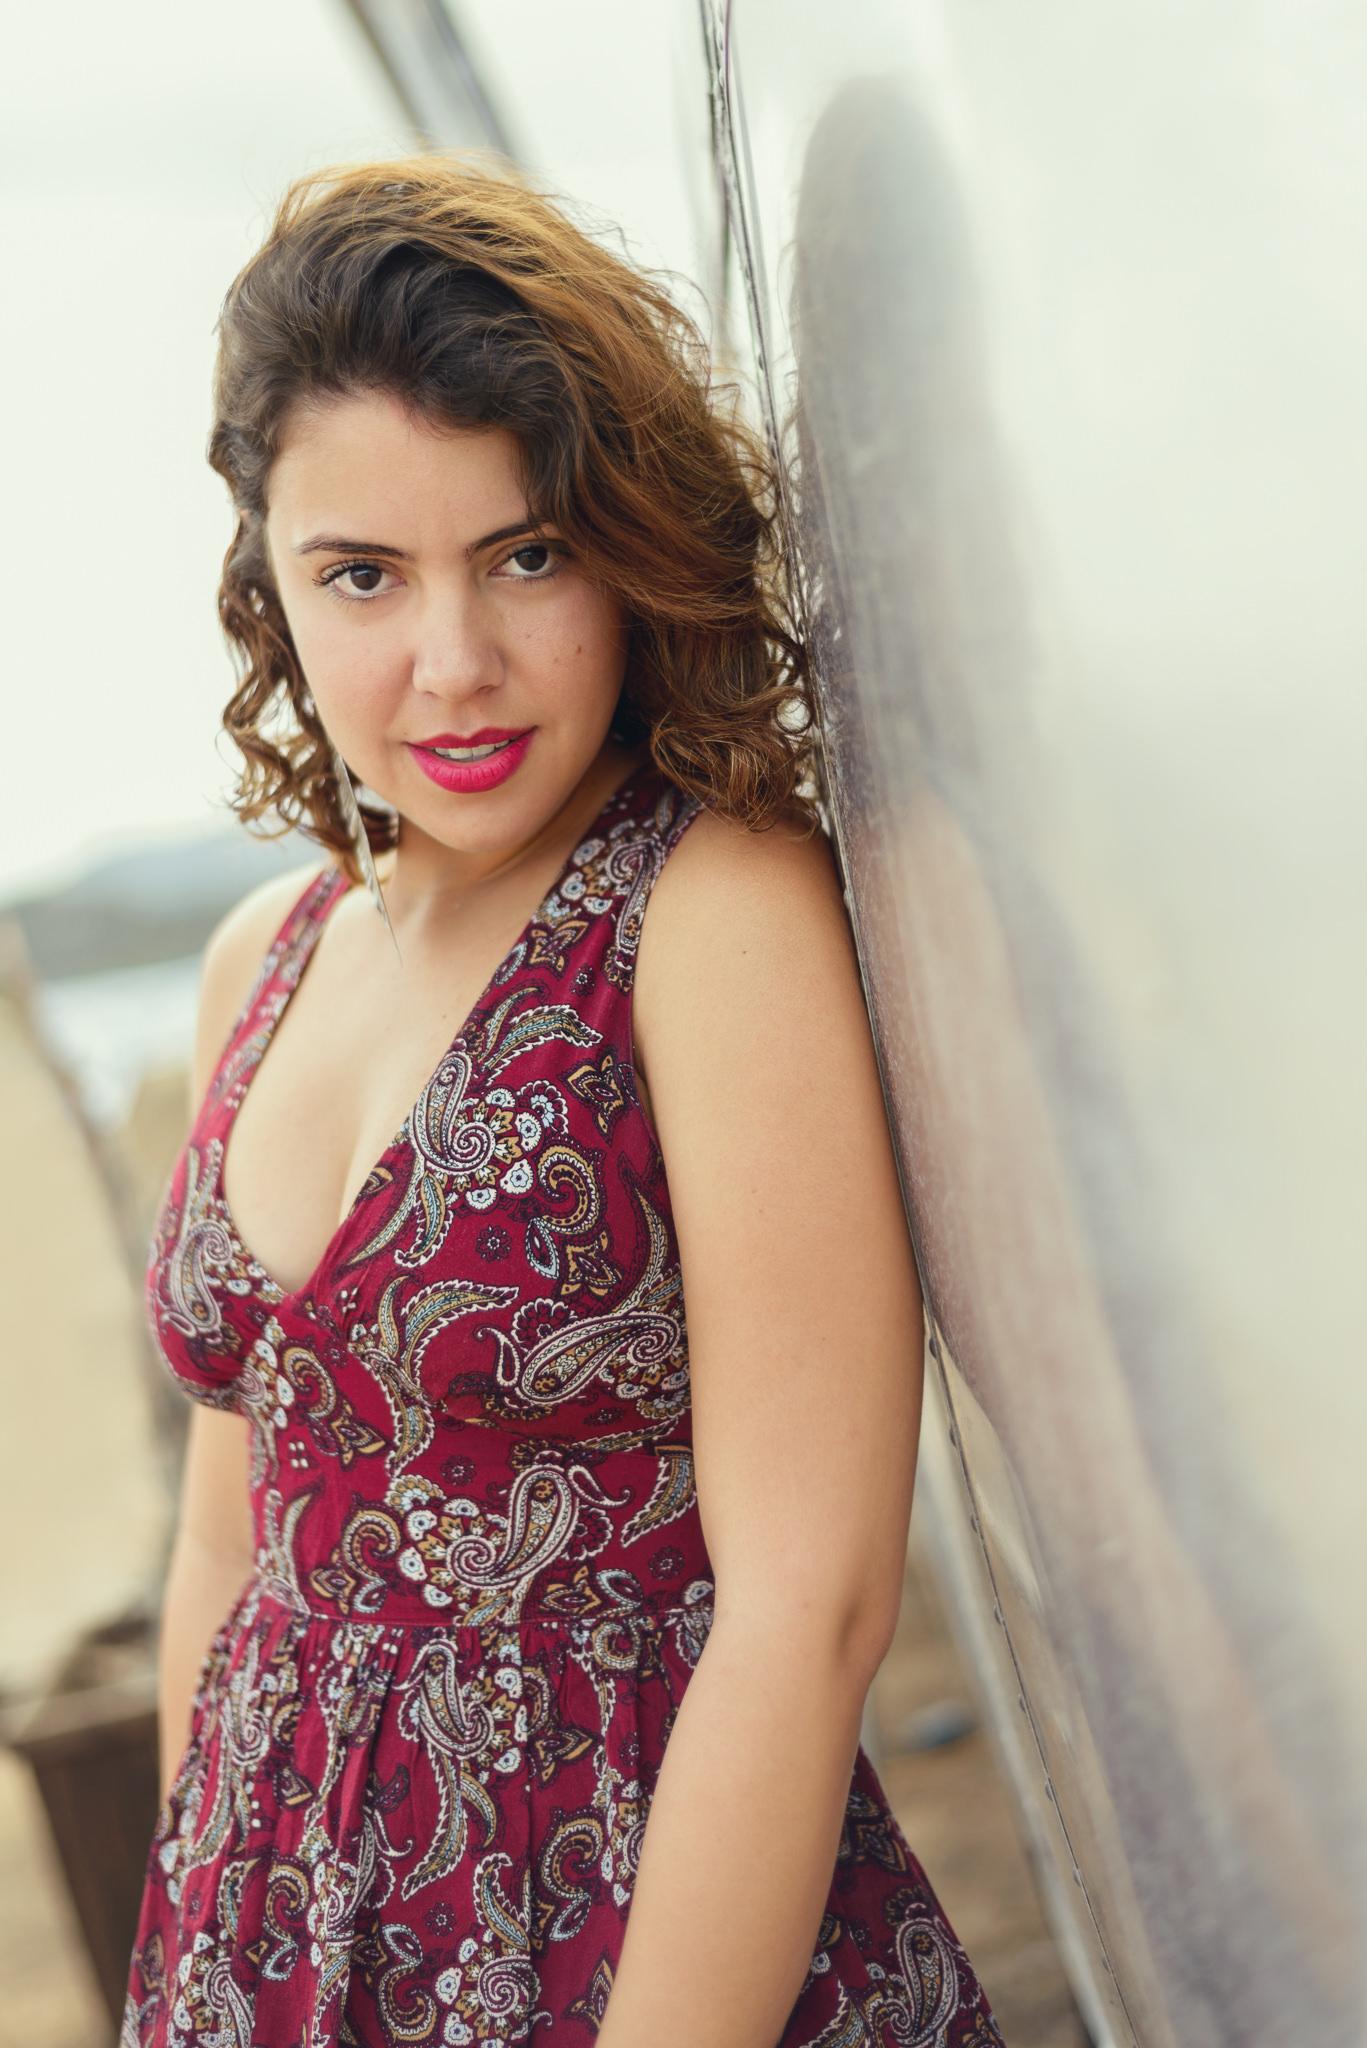 Melissa-alcantar-fotografia-Mexicali-Workshop-Be-here-project-Juliana